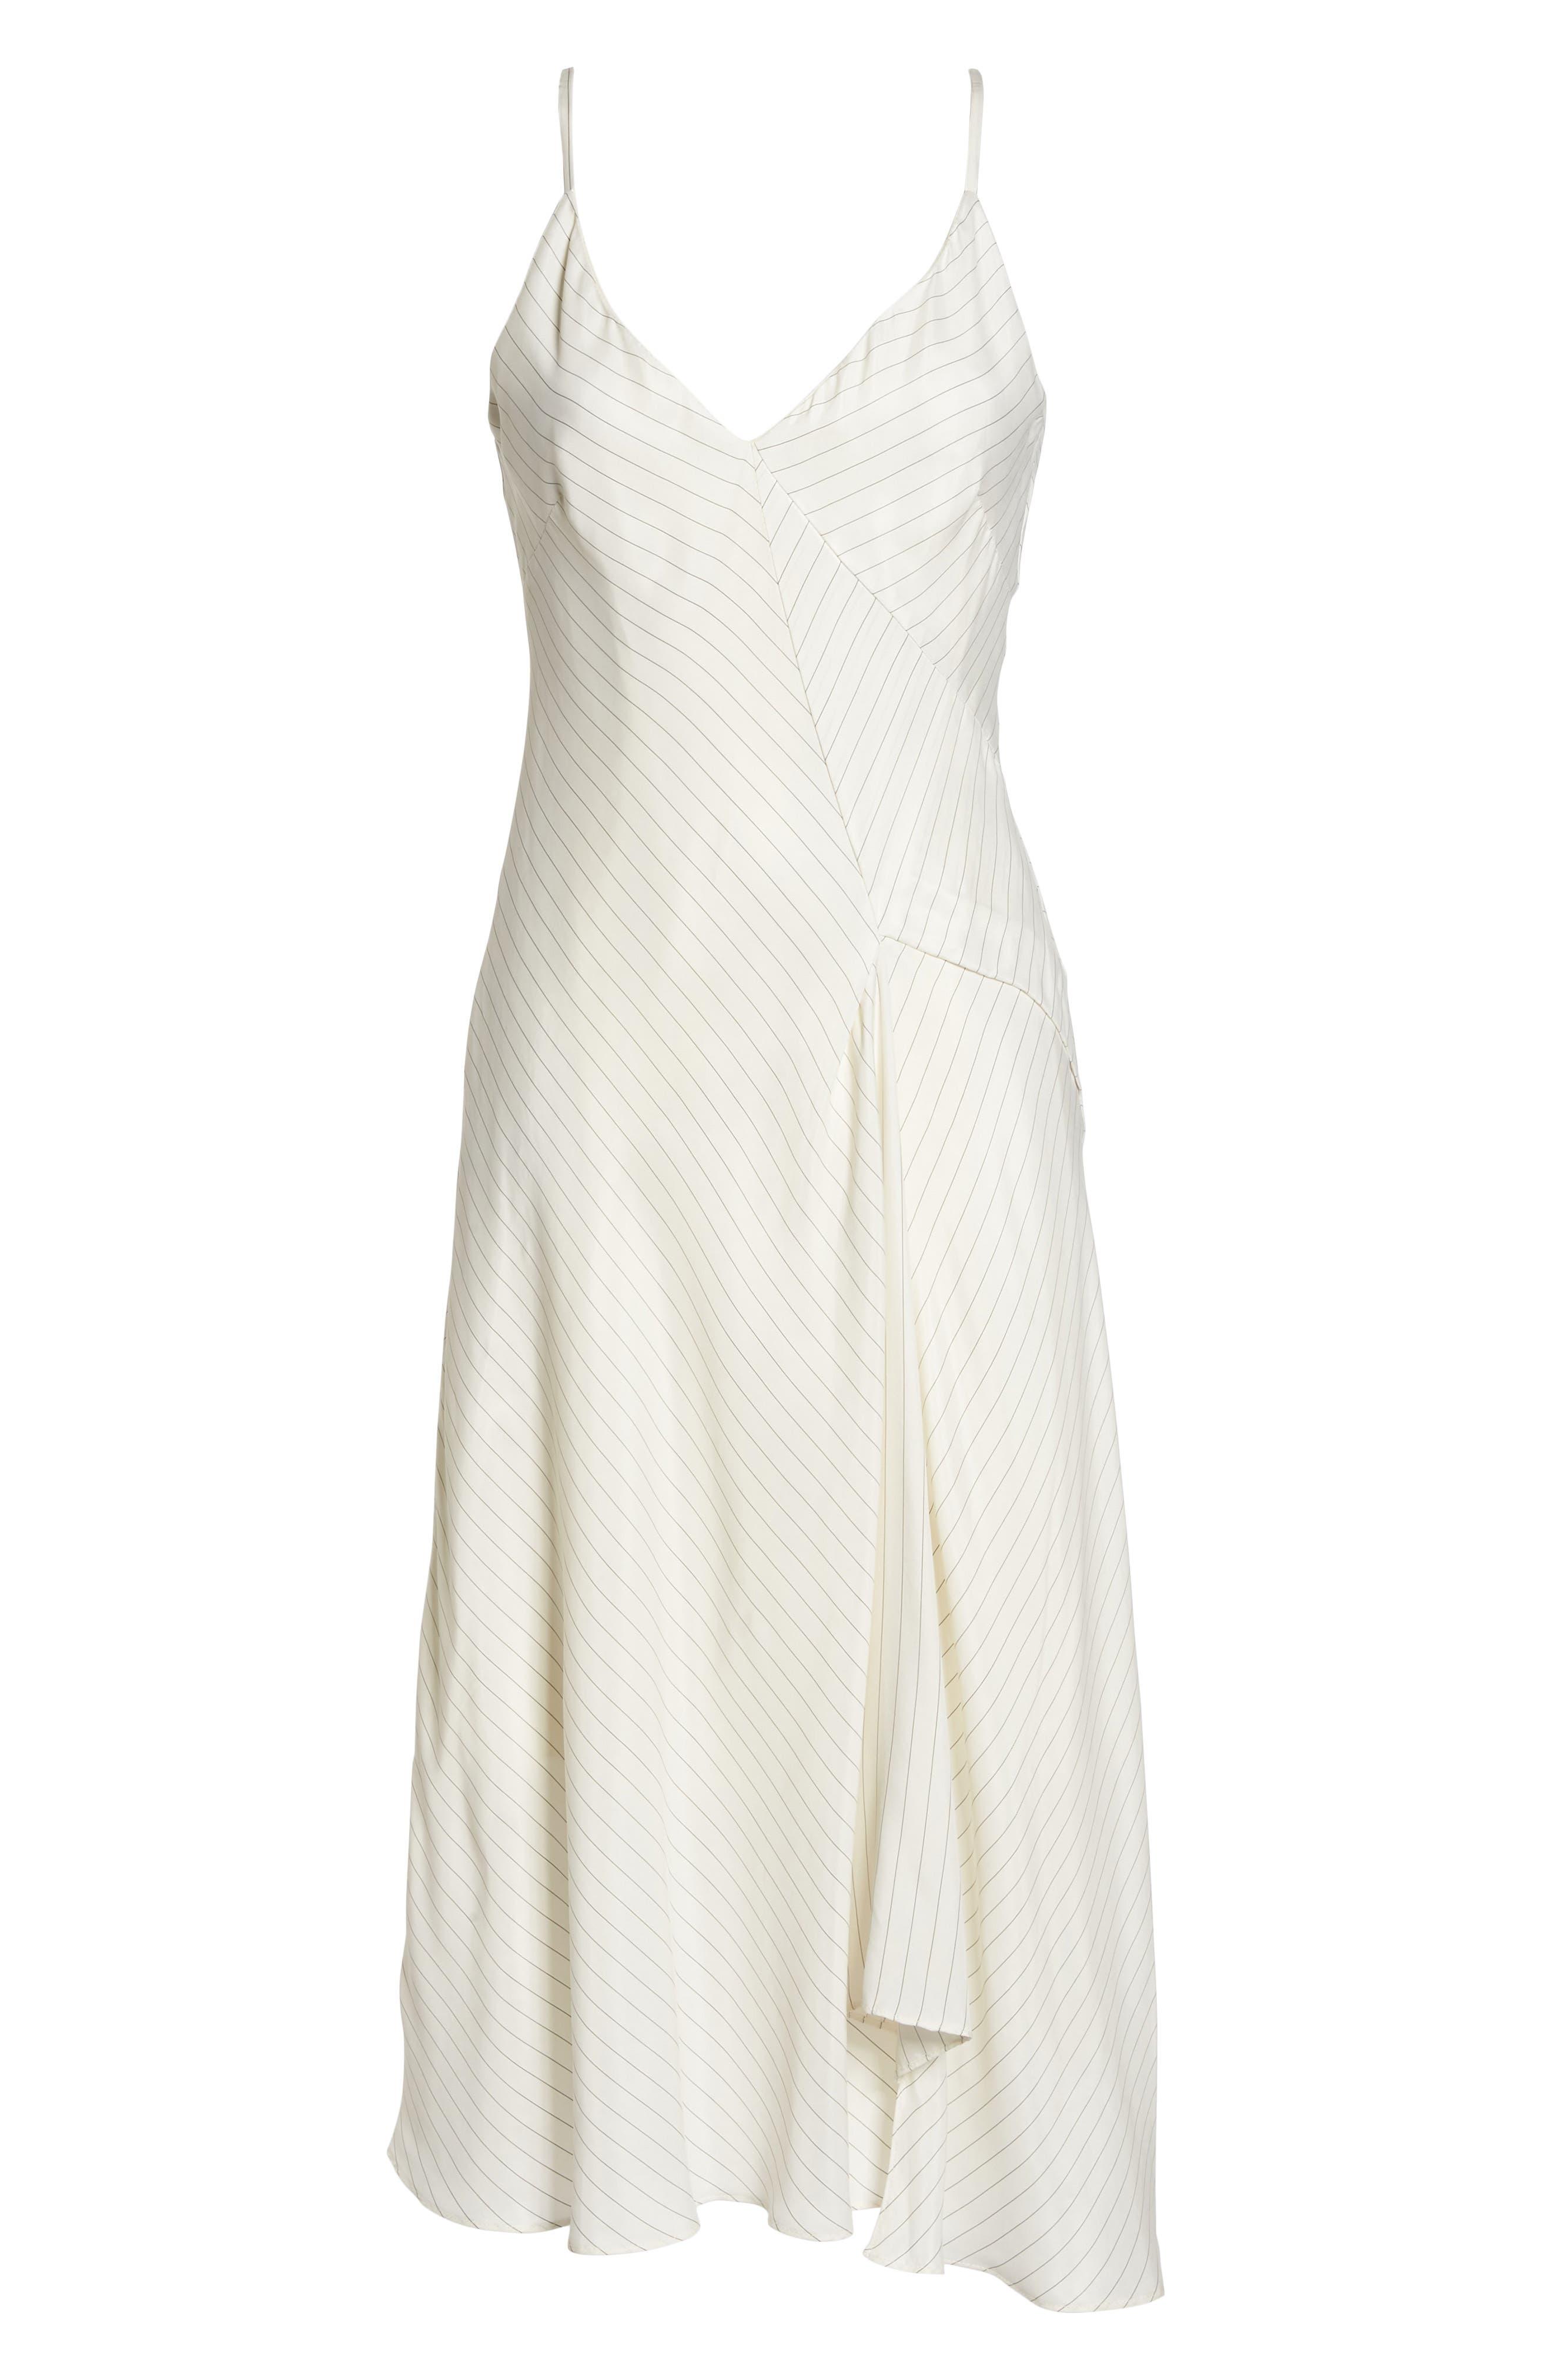 Bay Area Pinstripe Asymmetric Midi Dress,                             Alternate thumbnail 7, color,                             105